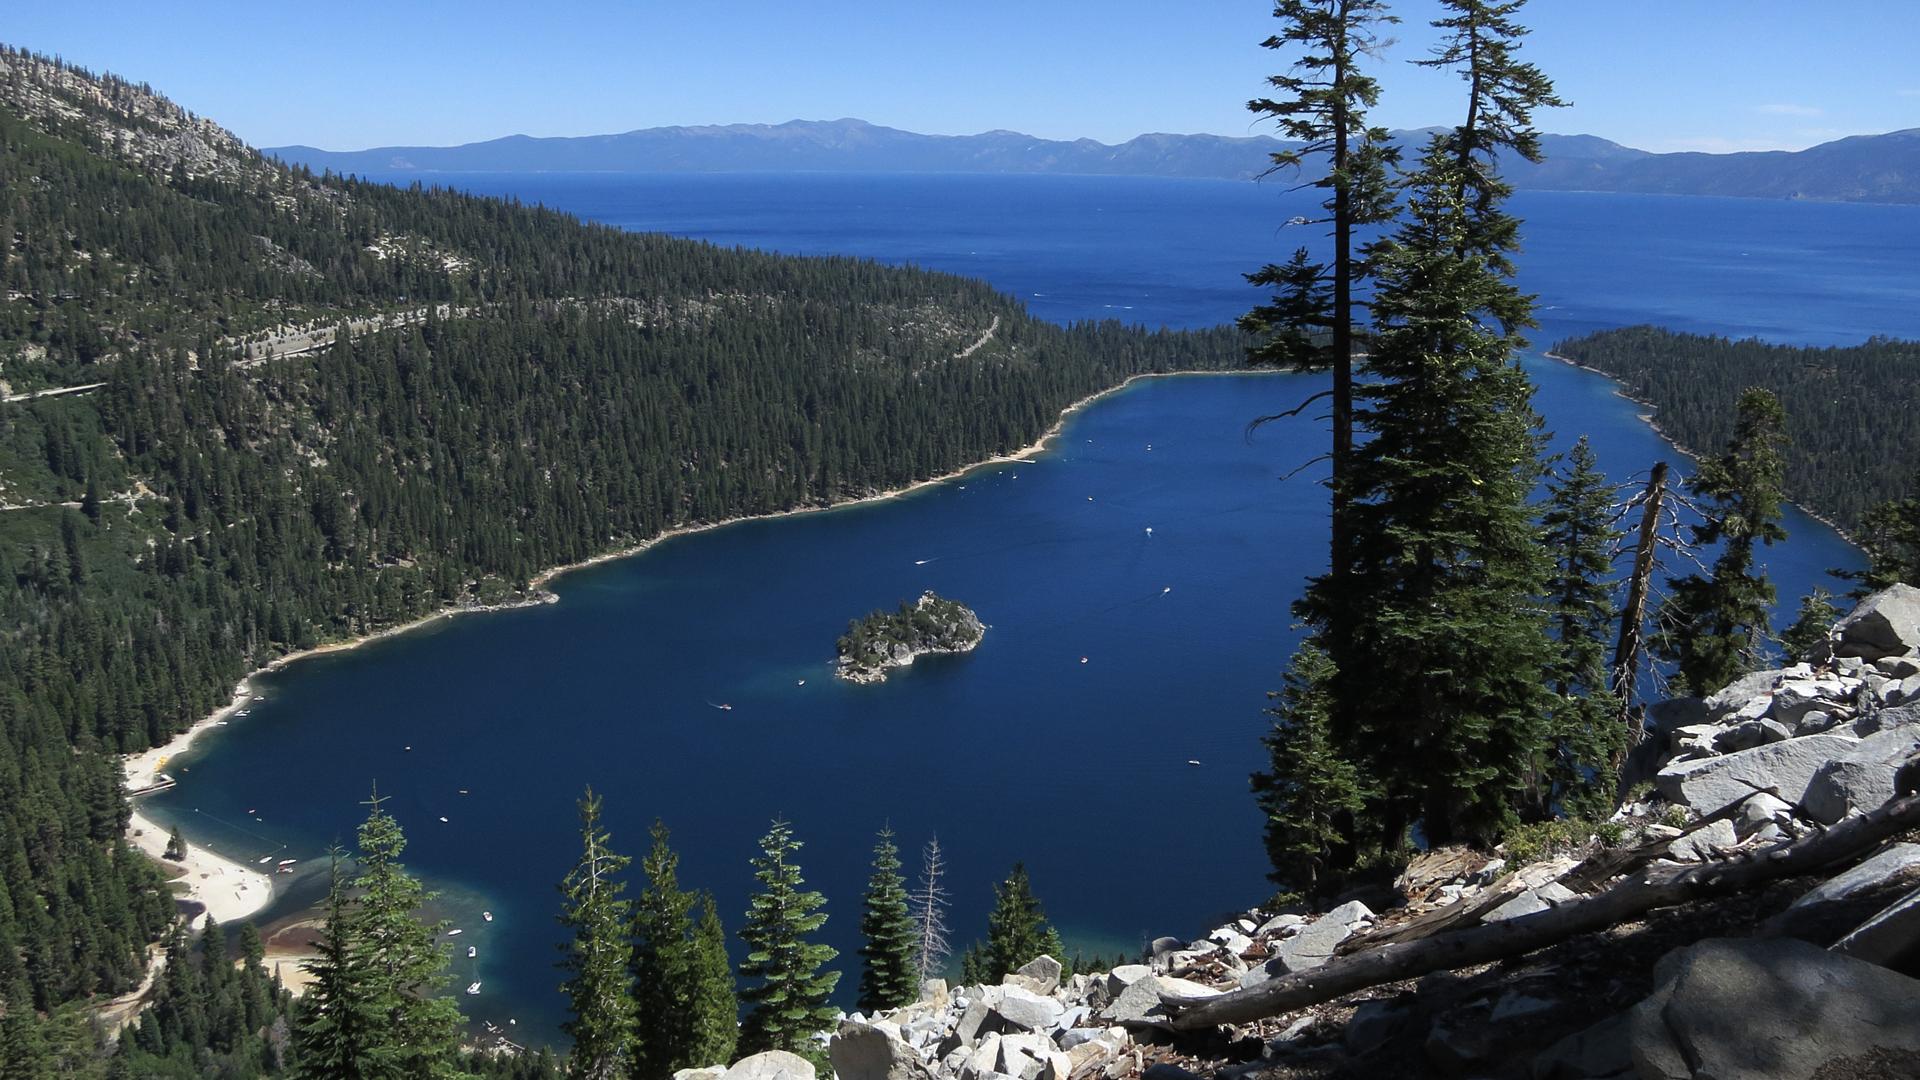 Emerald Bay lies under blue skies at Lake Tahoe on July 23, 2014. (Credit: Sean Gallup/Getty Images)